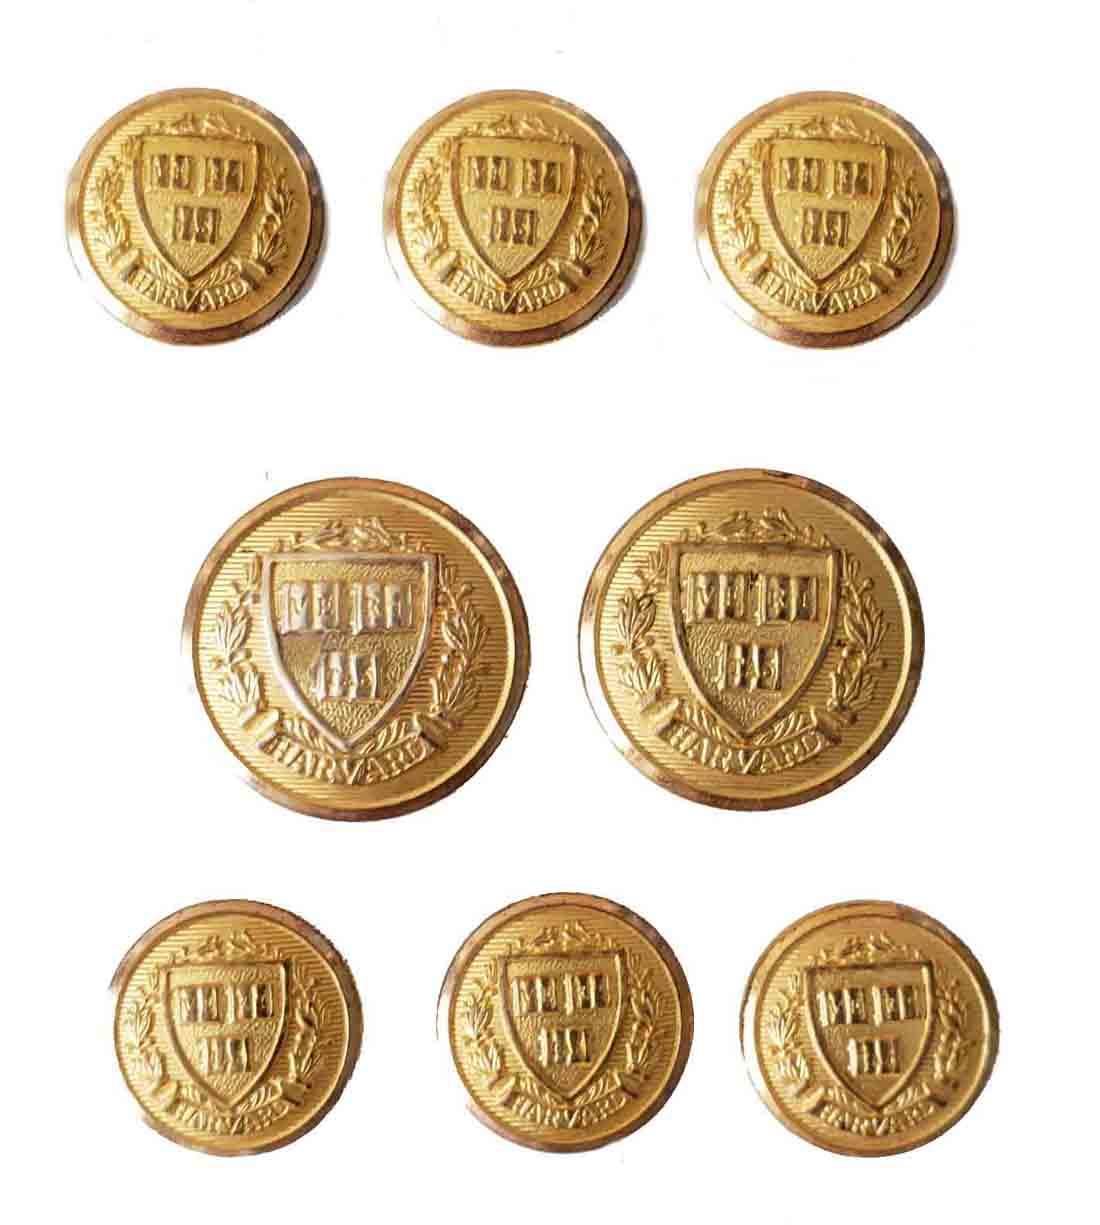 Vintage Waterbury Harvard Blazer Buttons Set Gold Brass Shank Men's